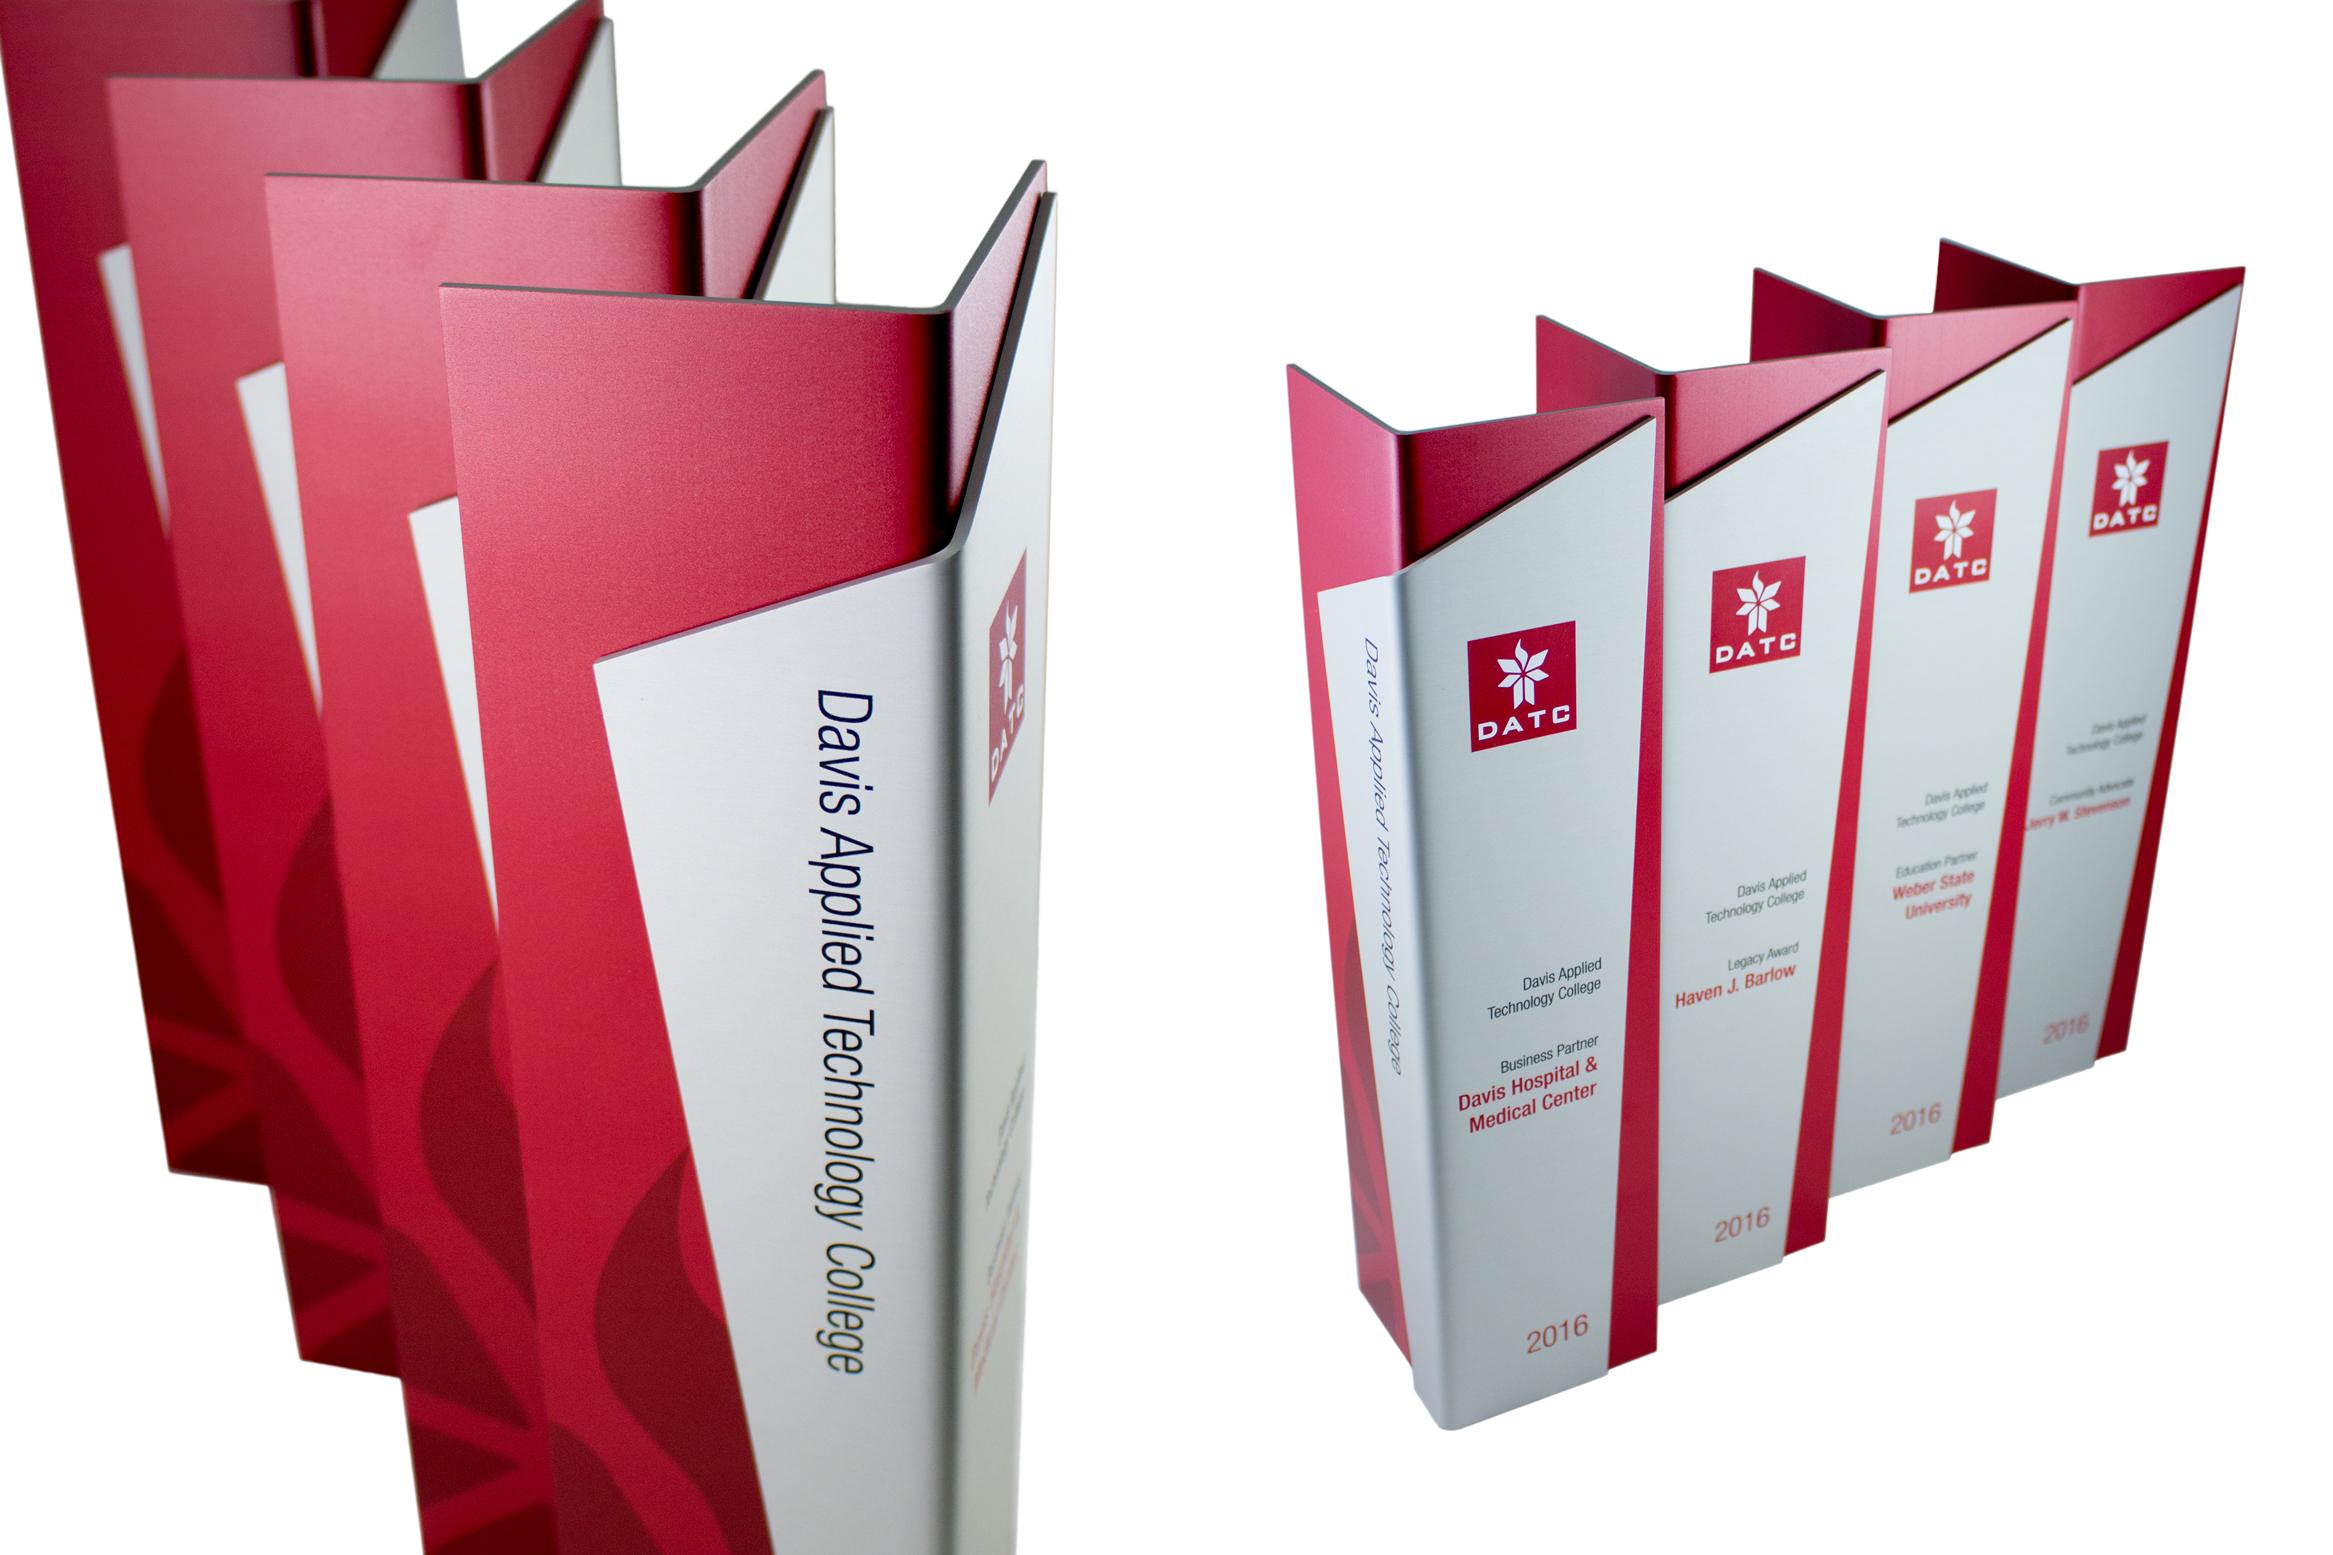 davis applied technology college - modern metal aluminum trophies awards